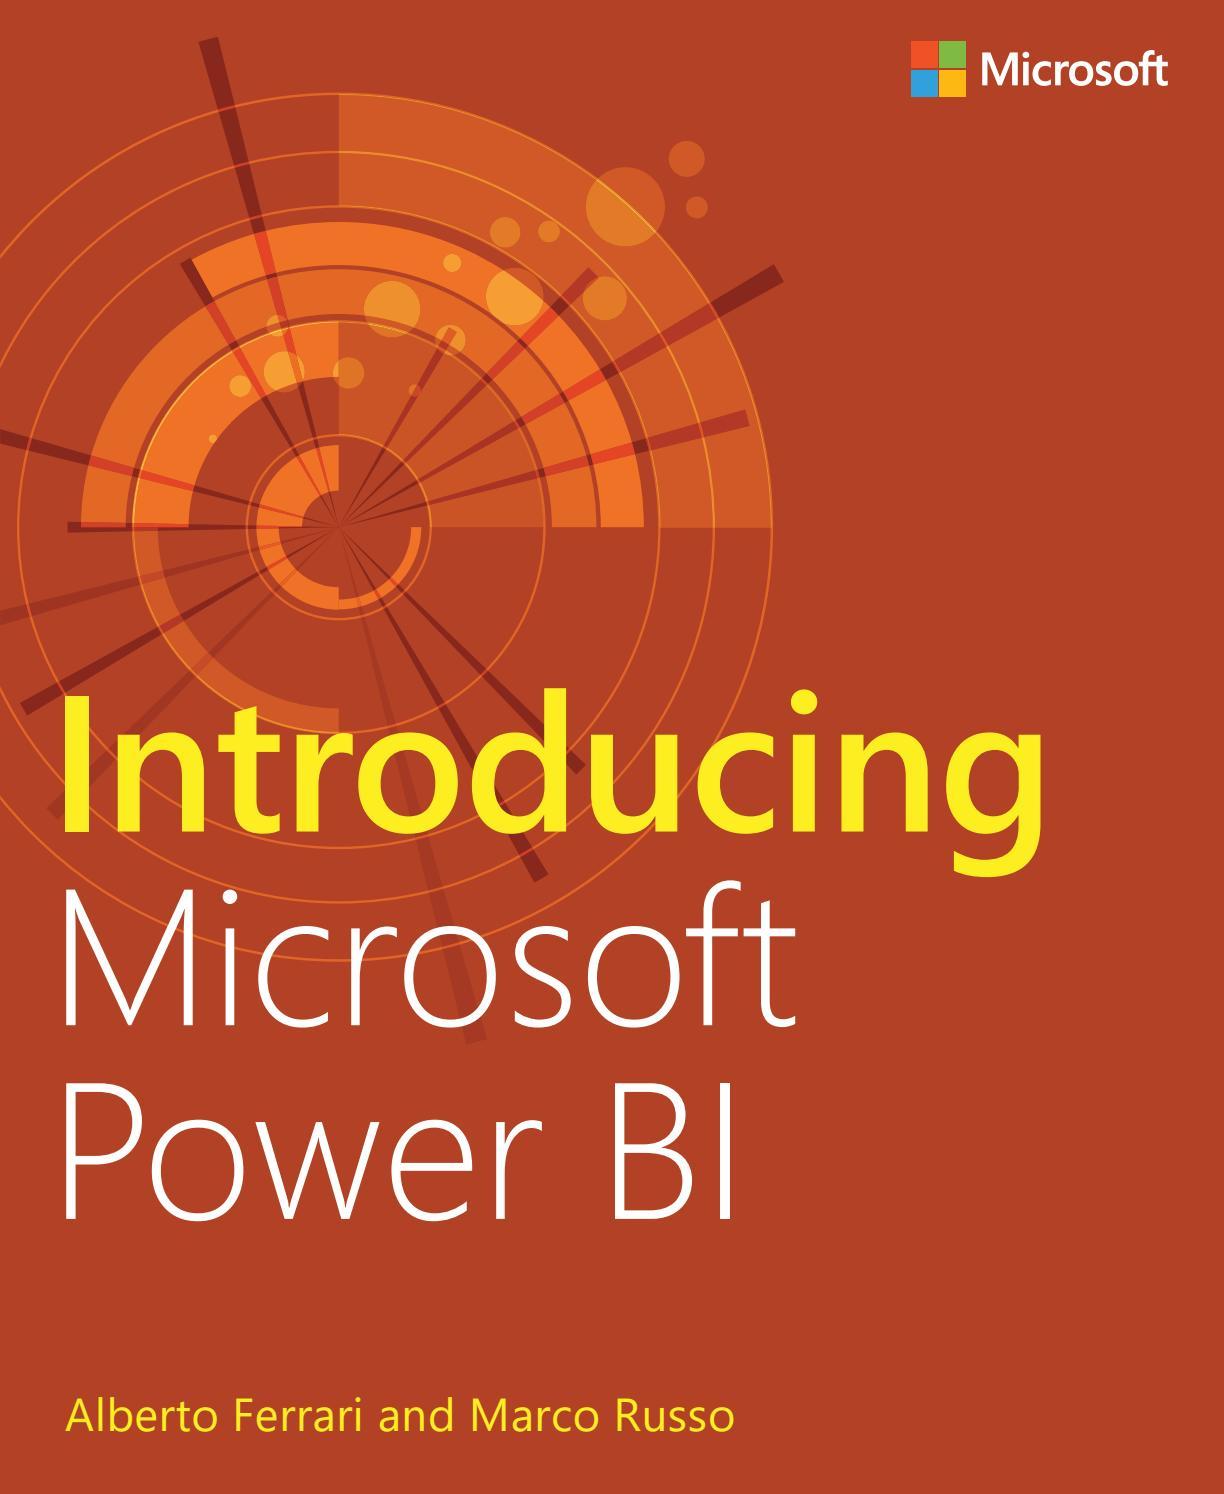 Power BI - Introduction by ANEGIS - Microsoft Dynamics